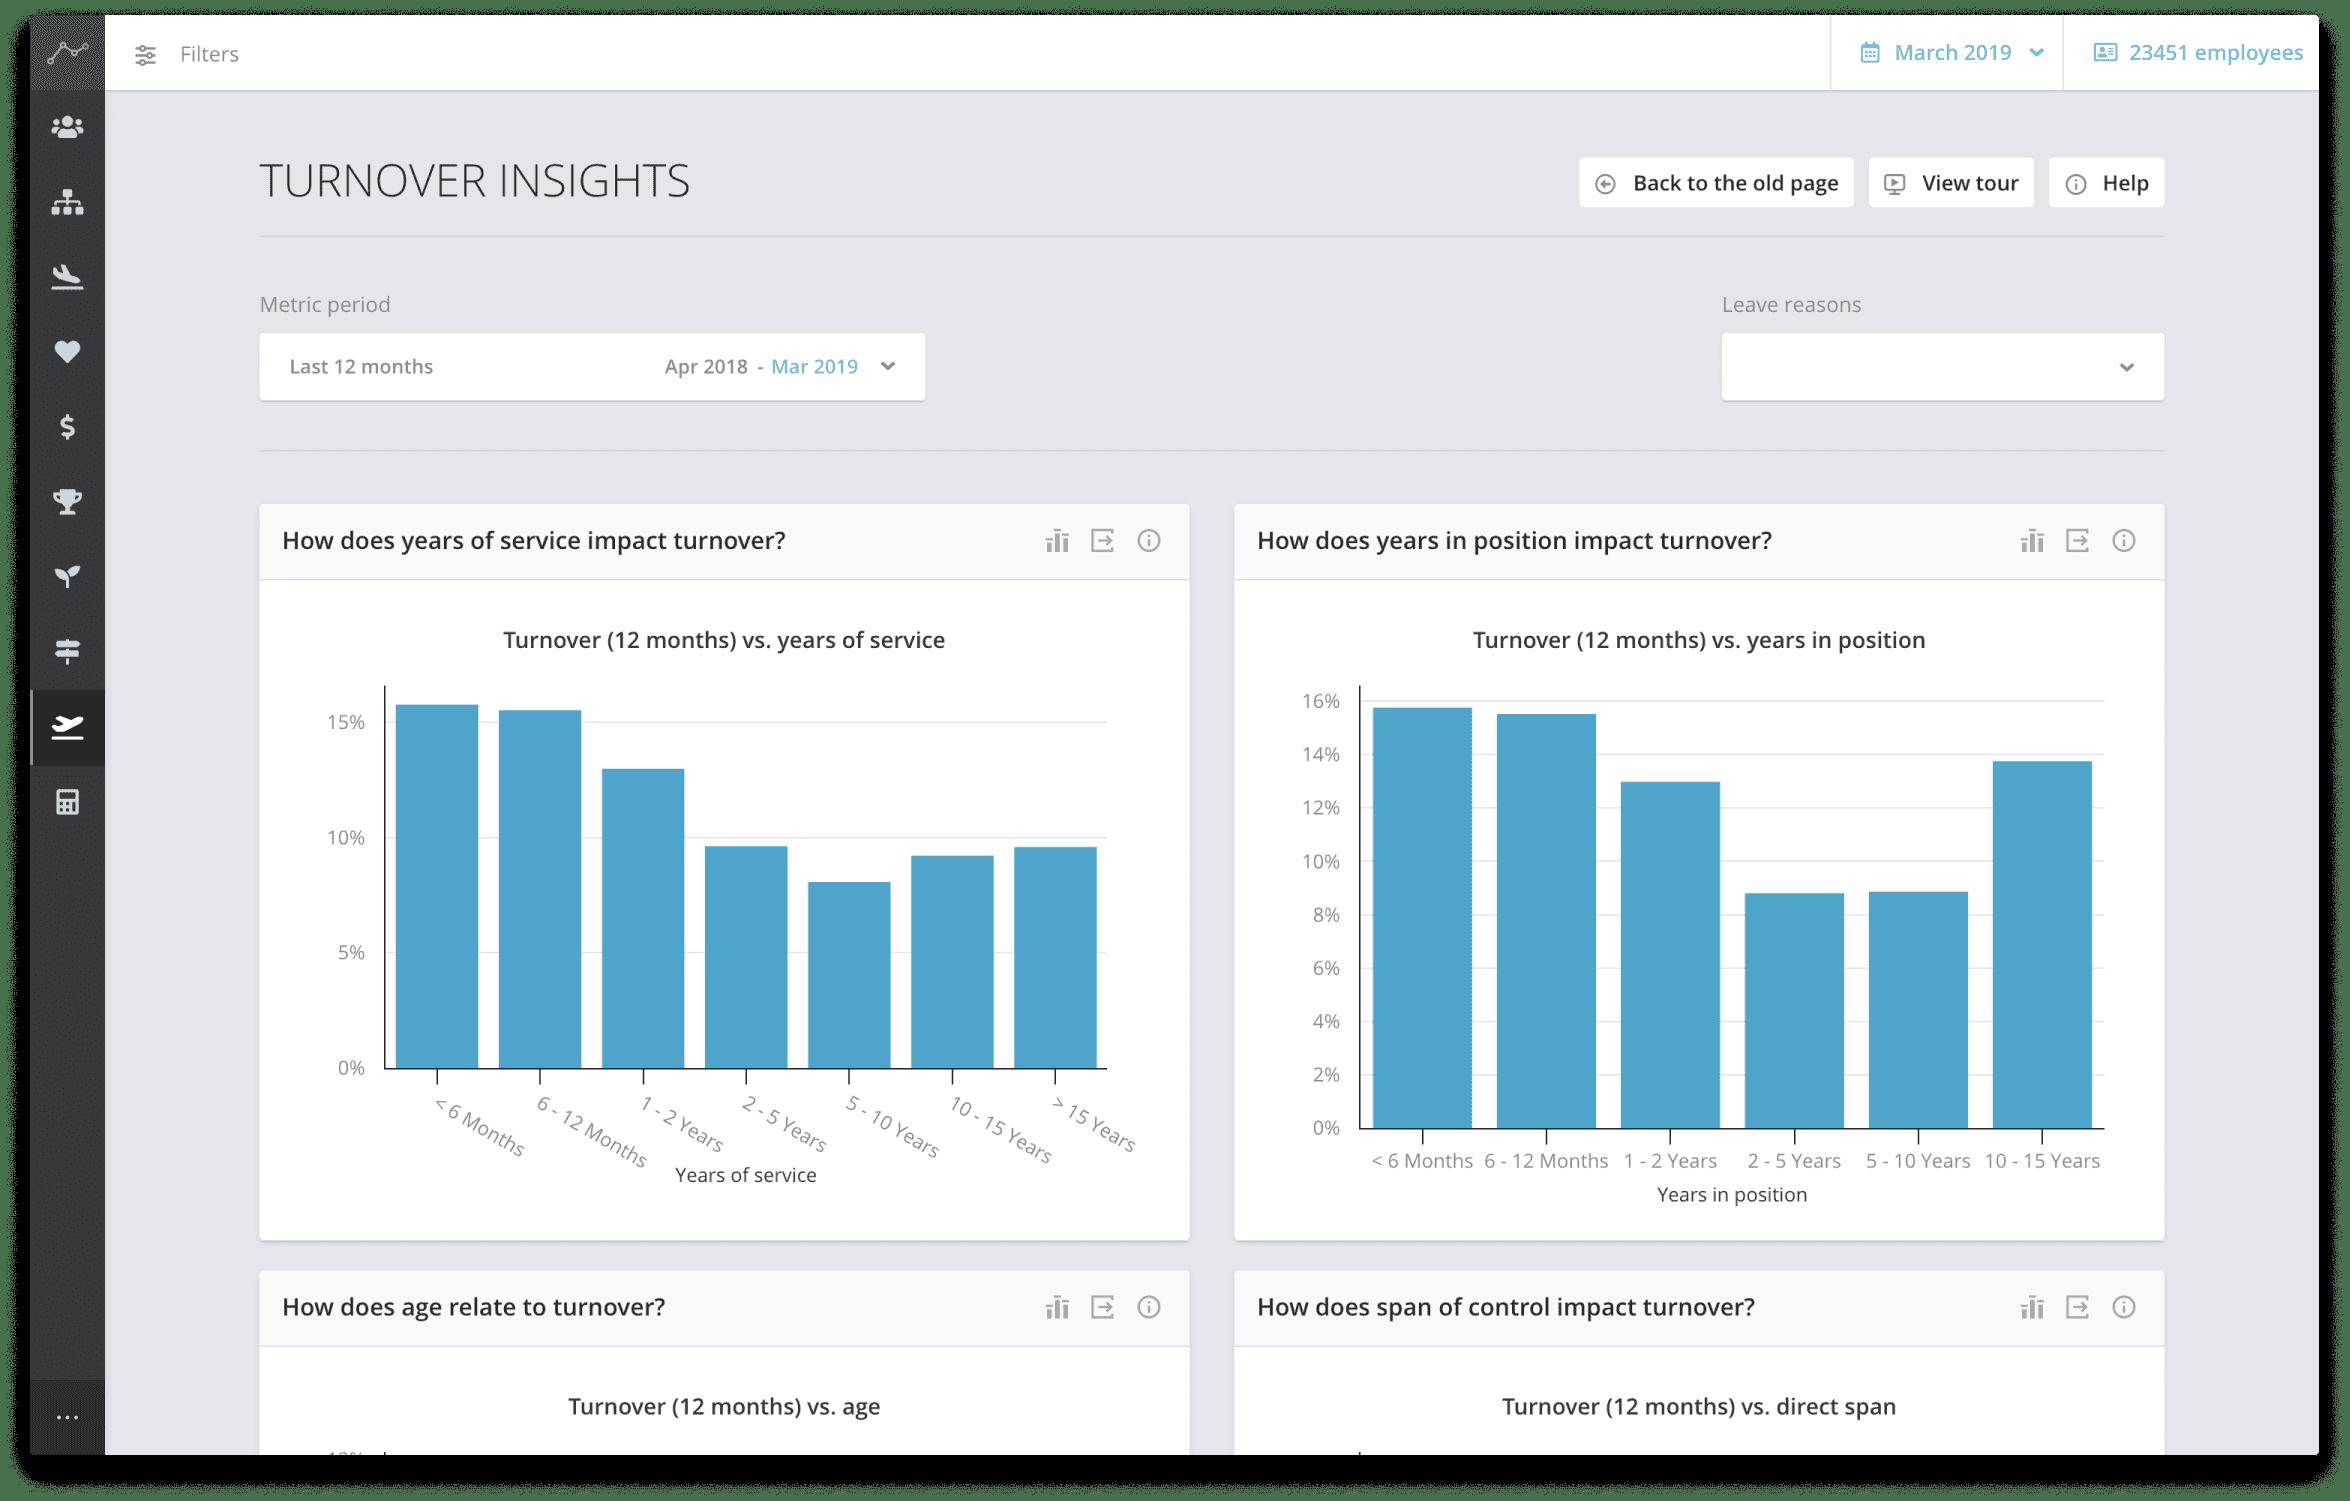 Crunchr People Analytics Software - Turnover Insights